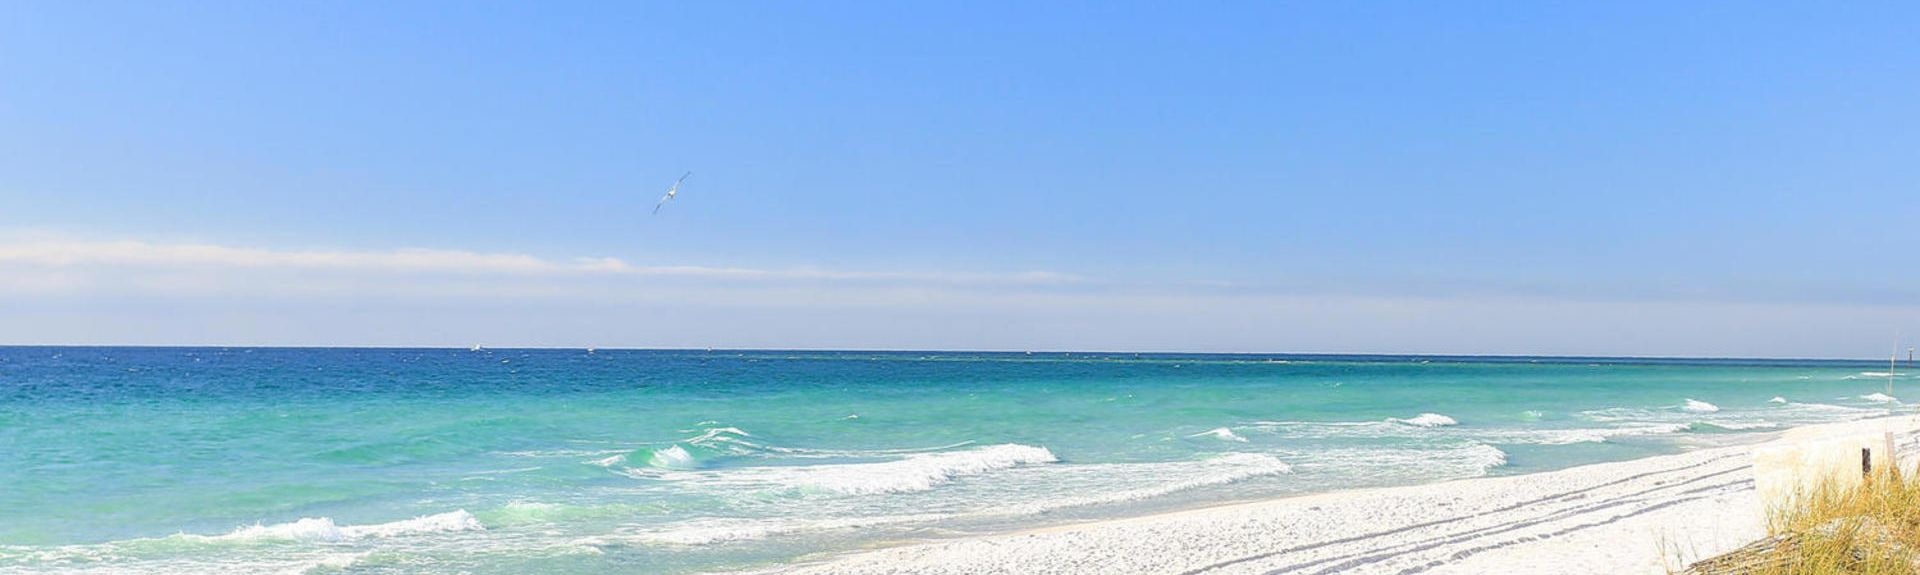 Aegean, Destin, FL, USA